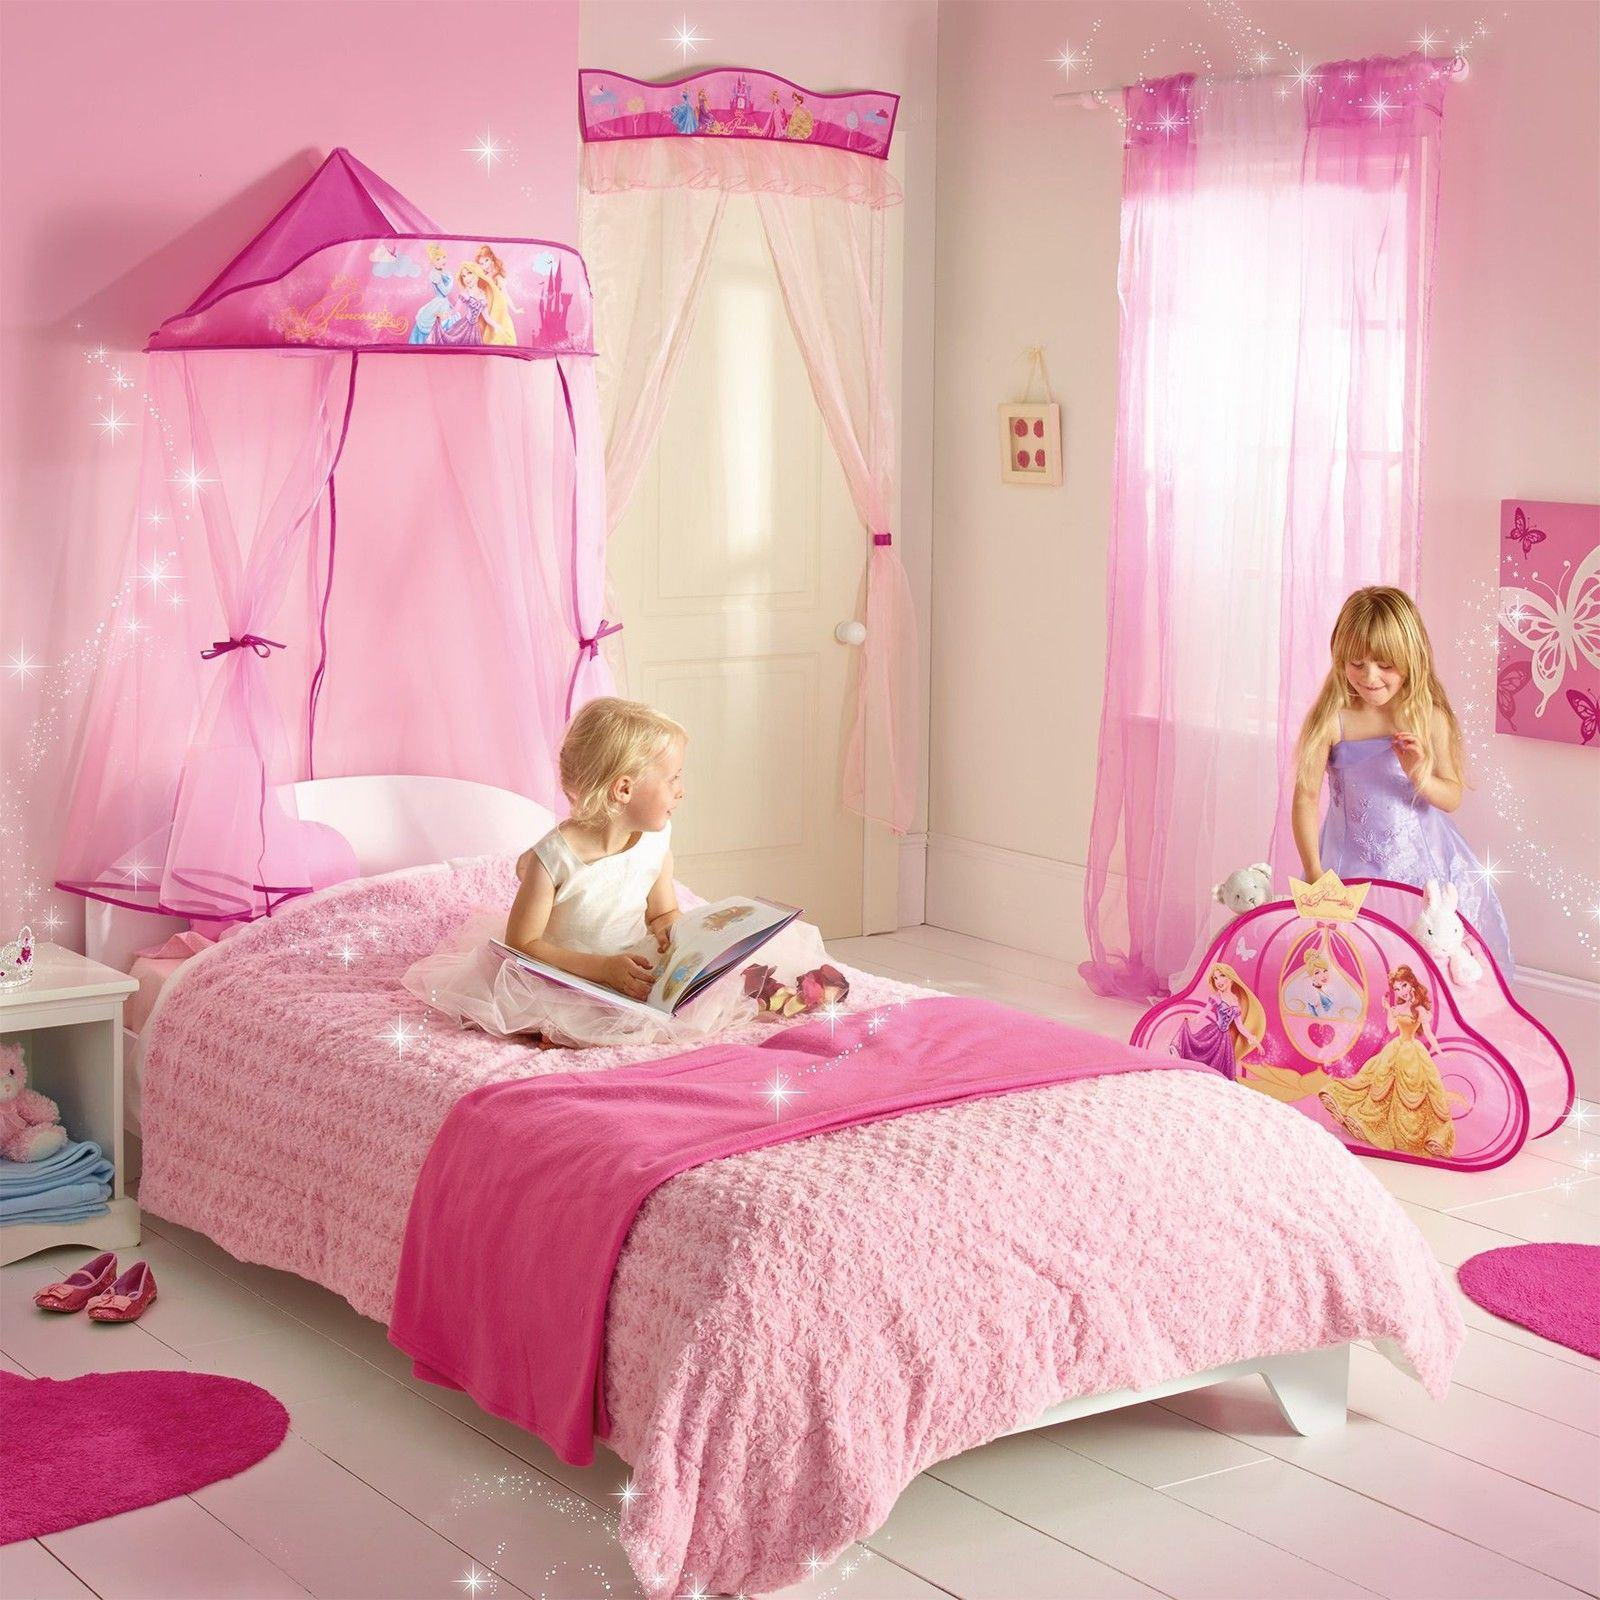 بالصور ديكورات غرف نوم بنات , تصميمات حديثة لغرف نوم بنات 2576 8